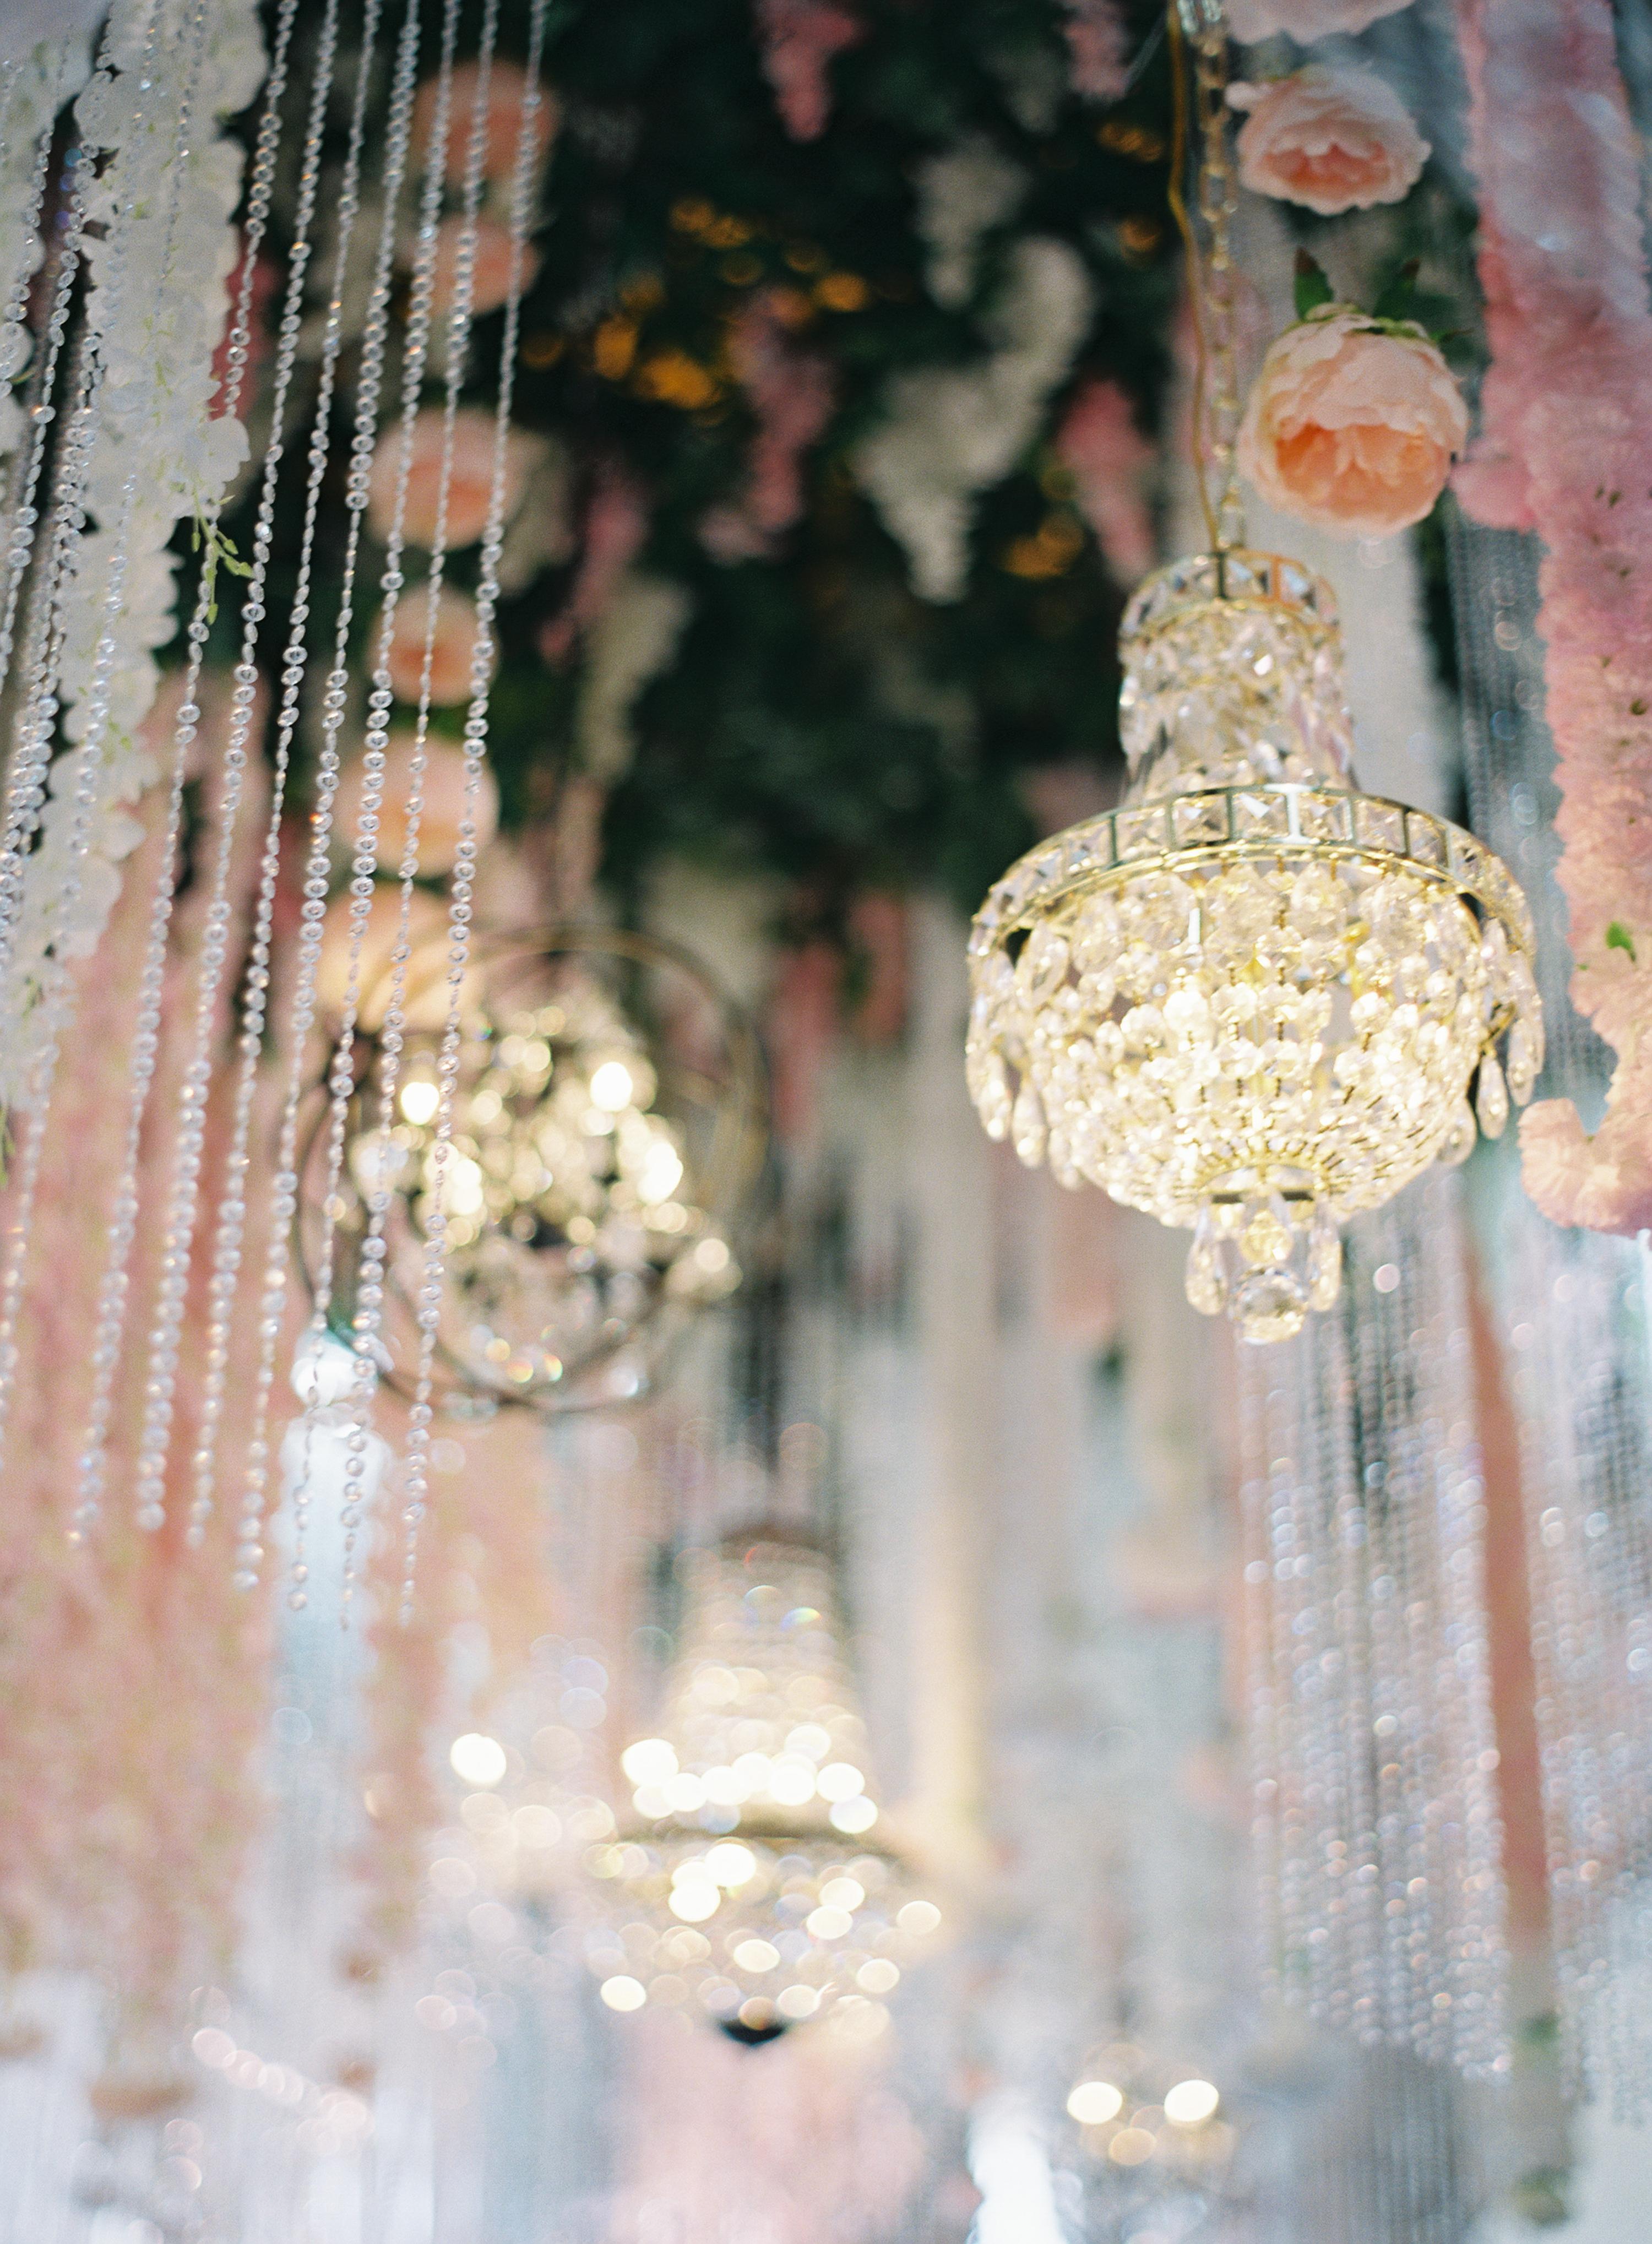 Athenaeum_Wedding_Hi_Res-76-Jen_Huang-005195-R1-012